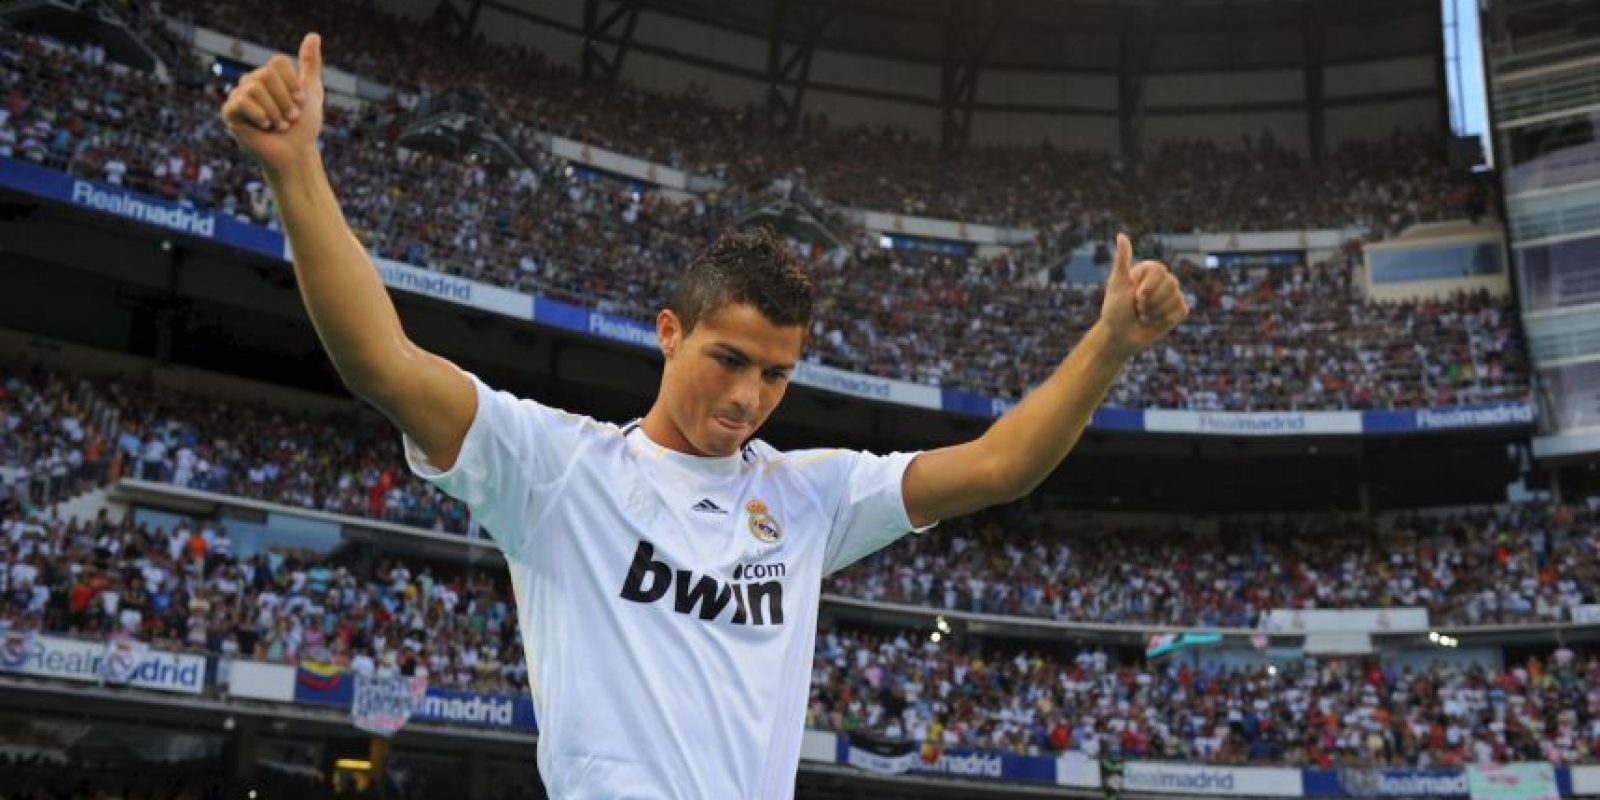 Así lucía el crack portugués a su llegada al Real Madrid, en 2009. Foto:Getty Images